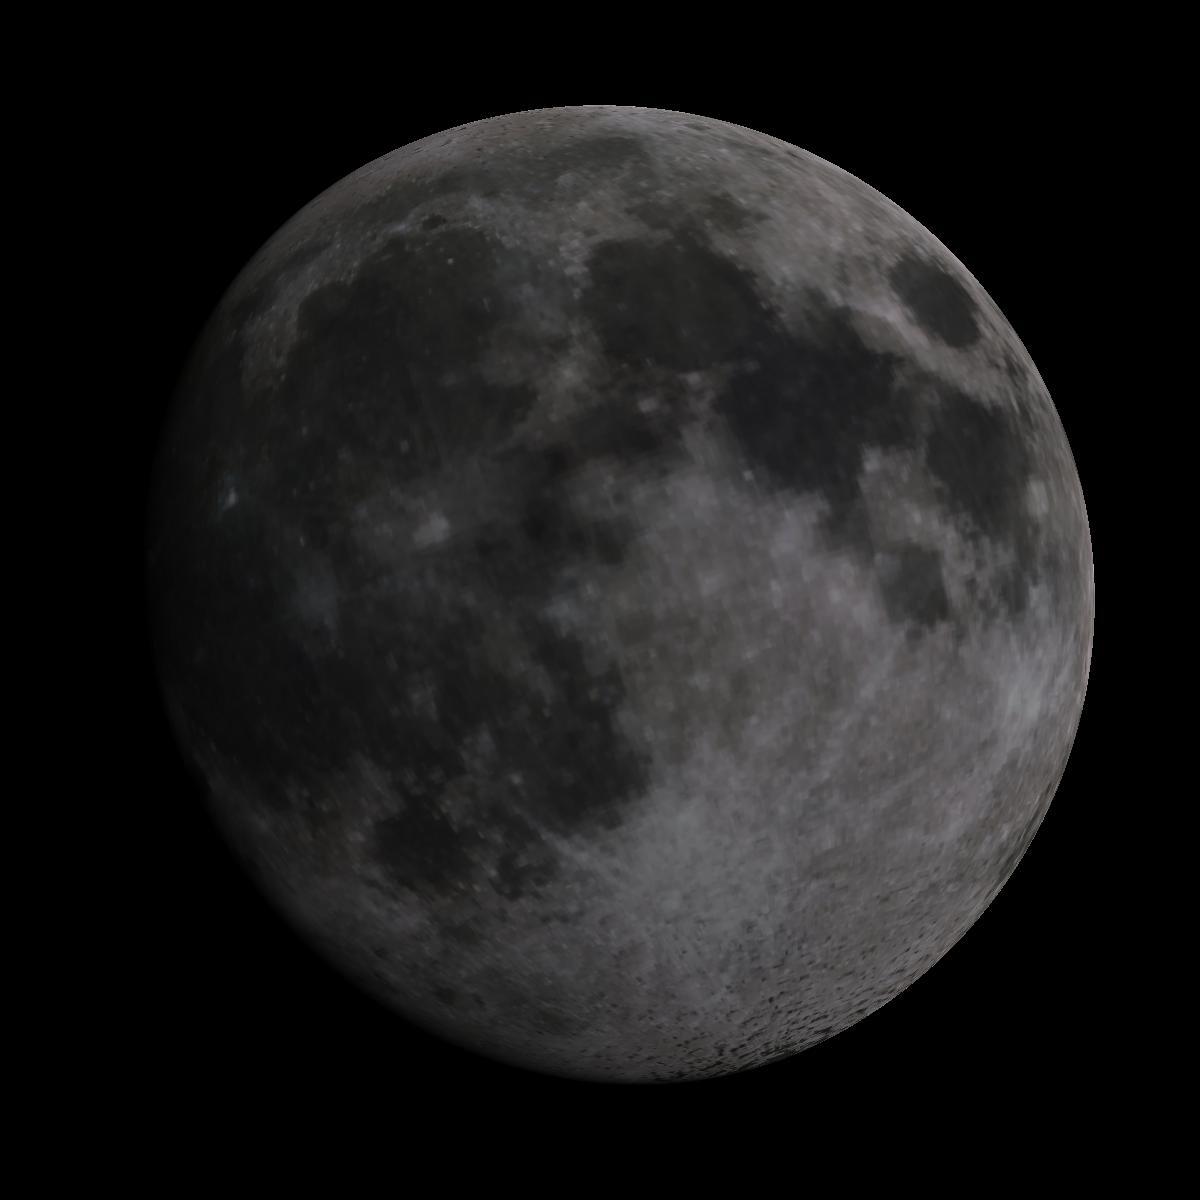 Lune du 8 mars 2020